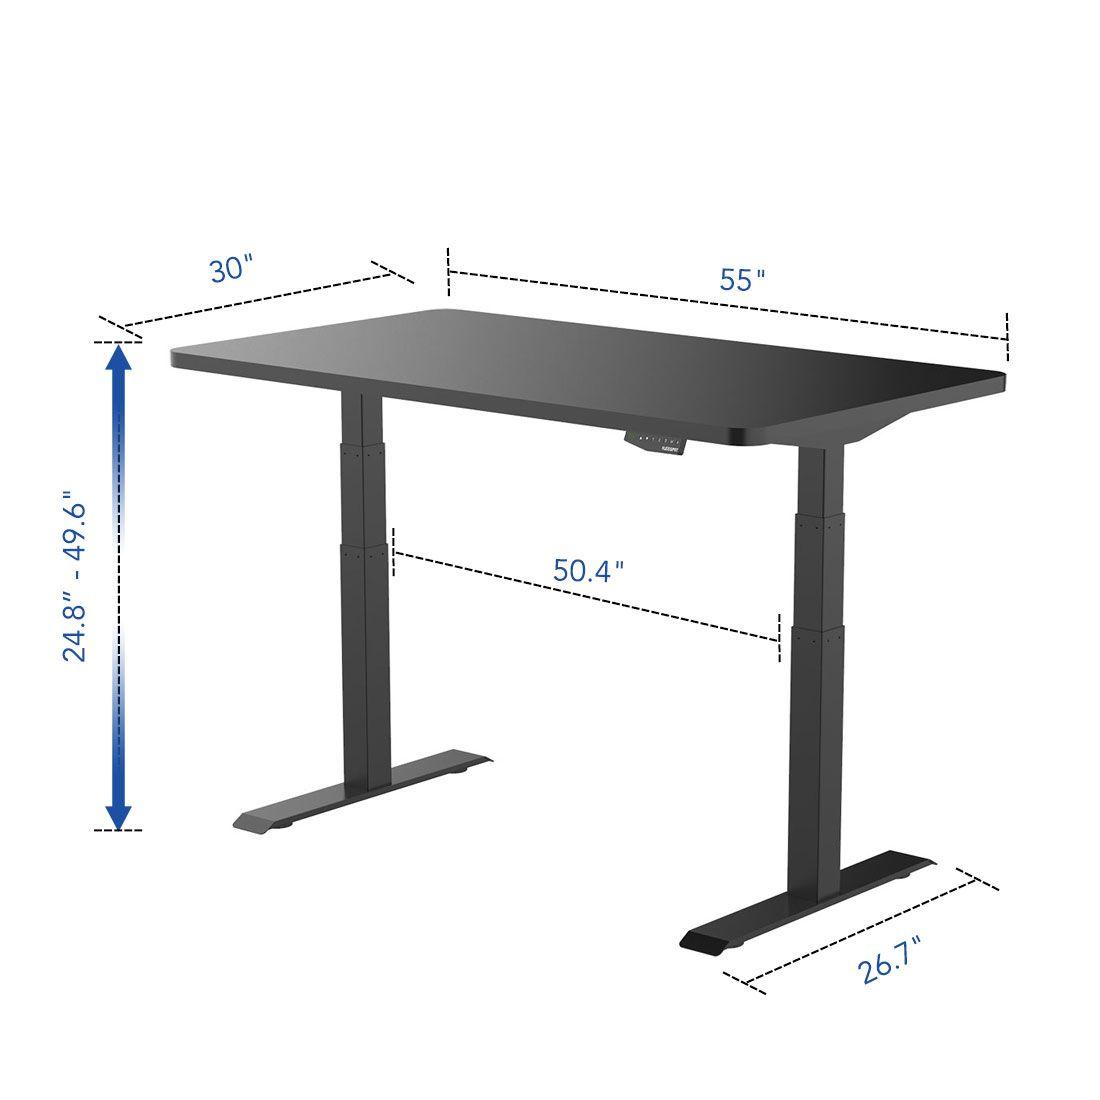 Flexispot Sanodesk Standing Desk Dimensions